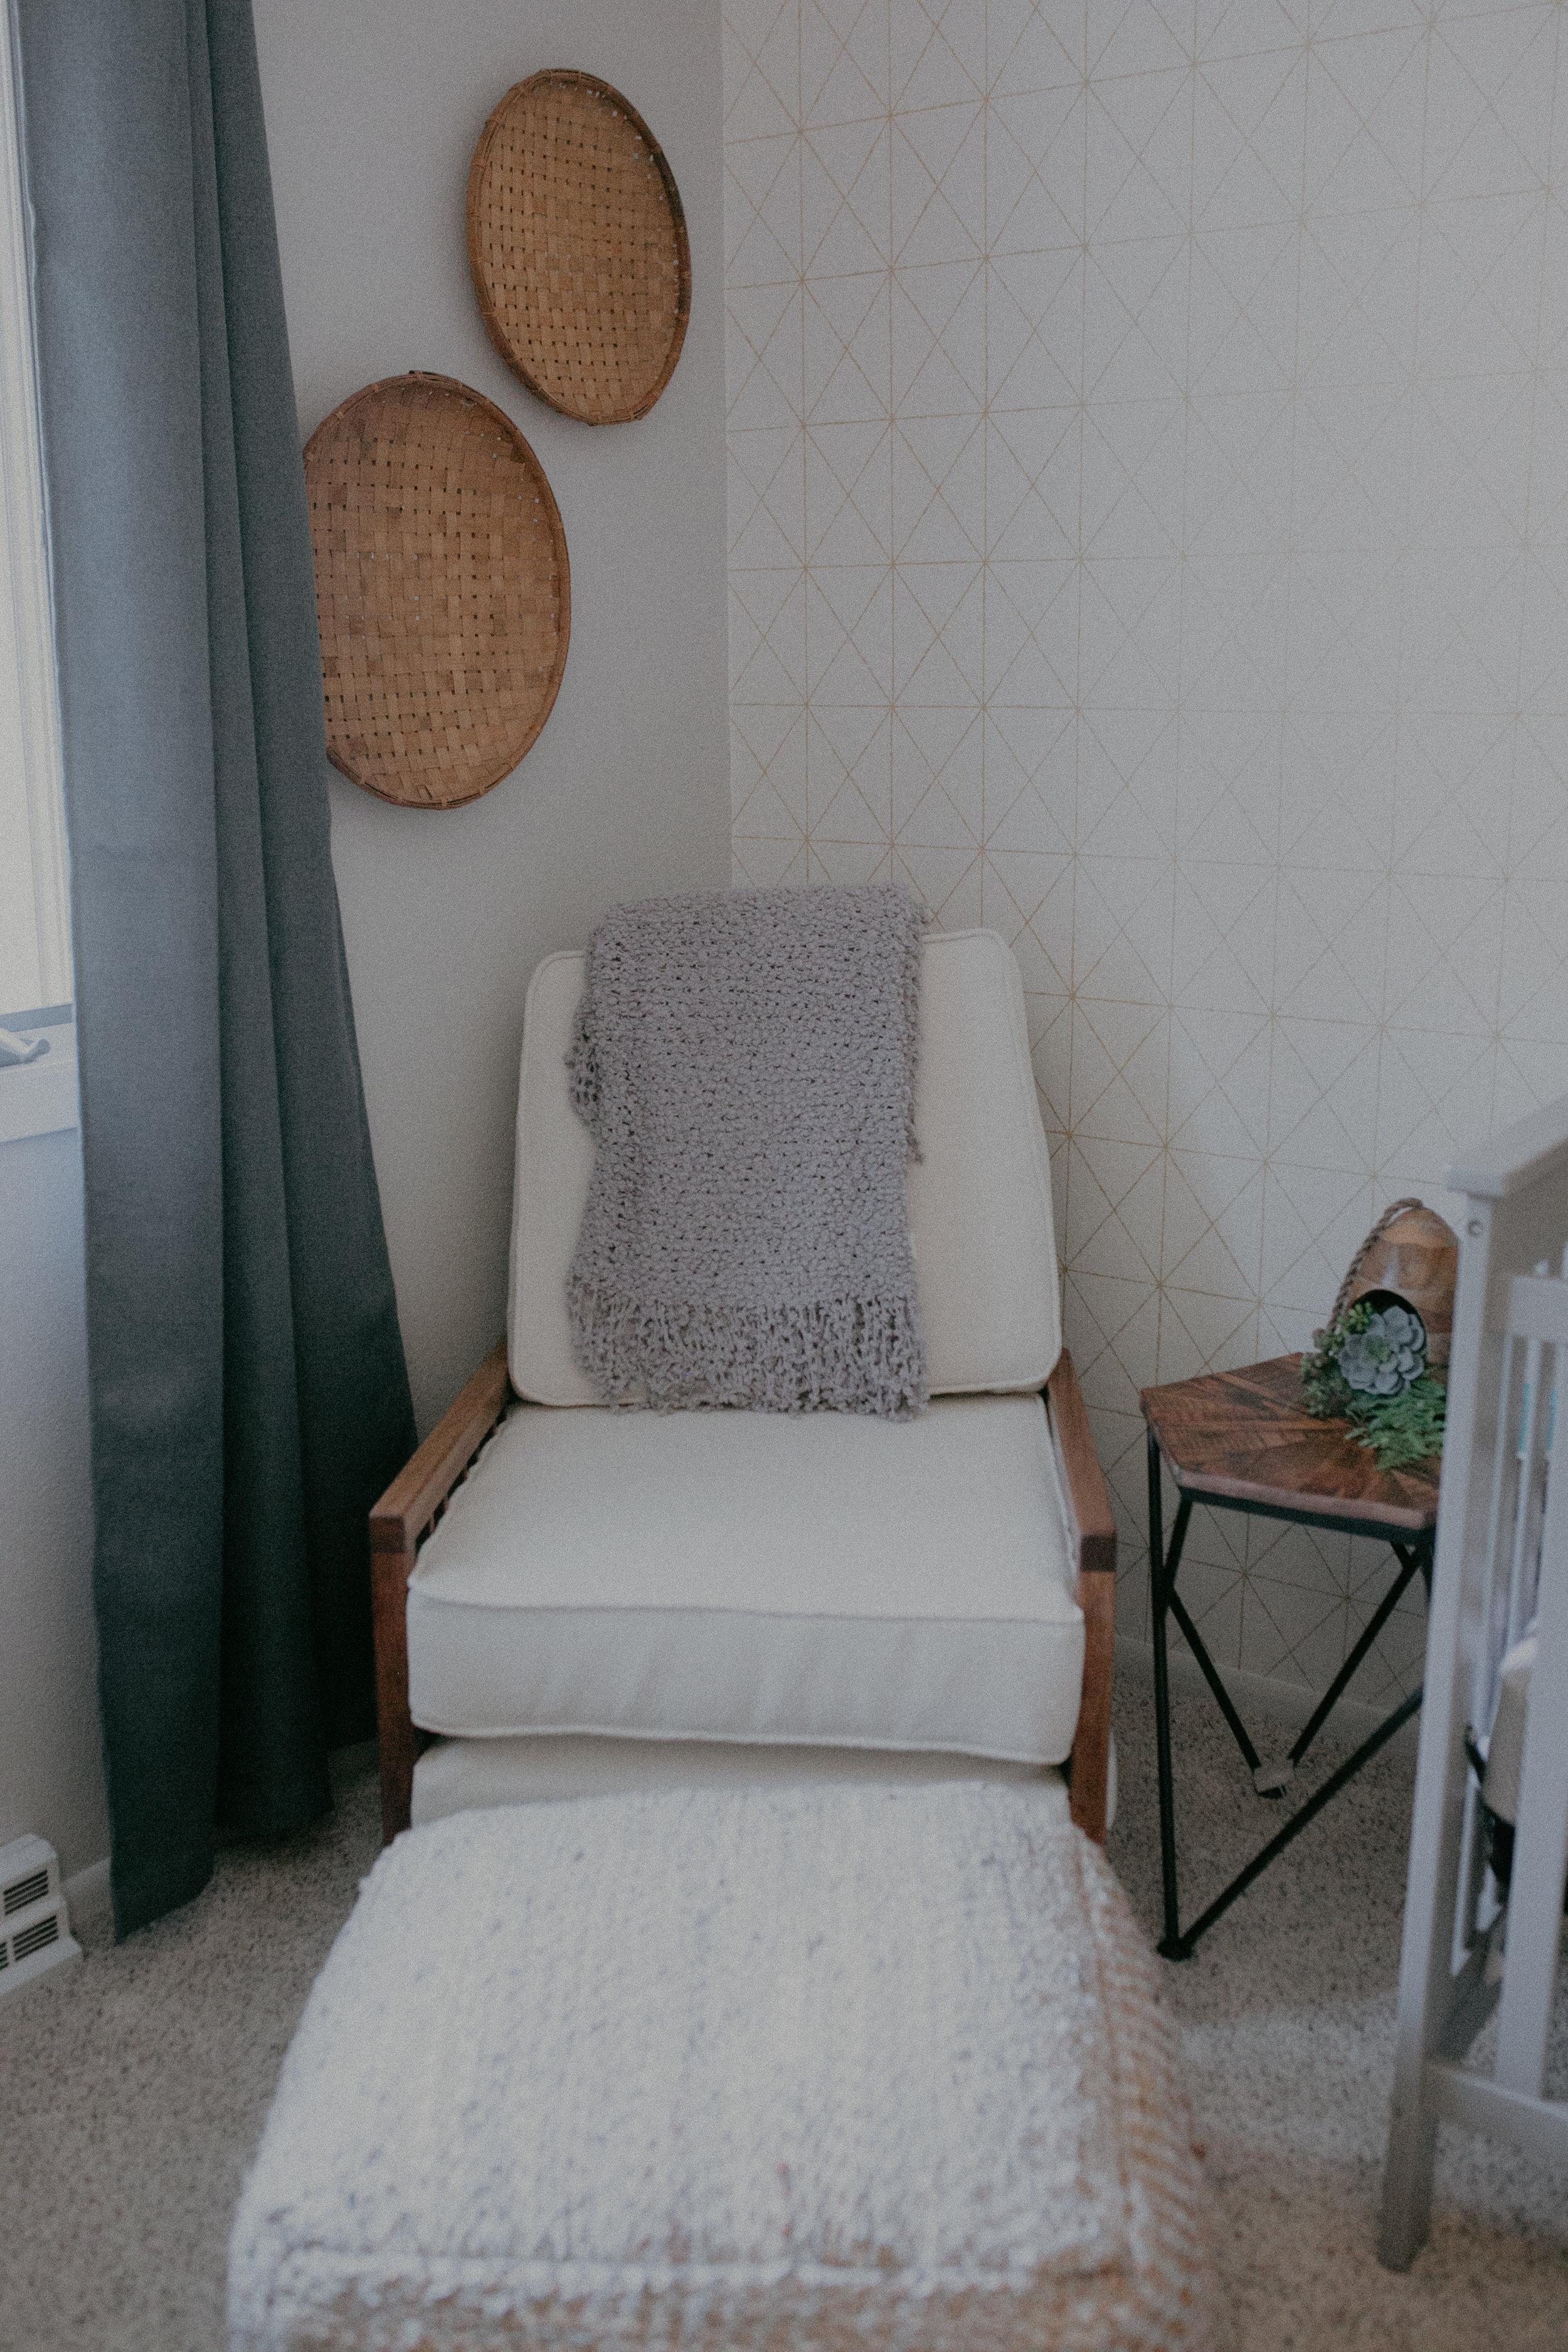 woven-basket-interior-design-river-falls-wi-nursery